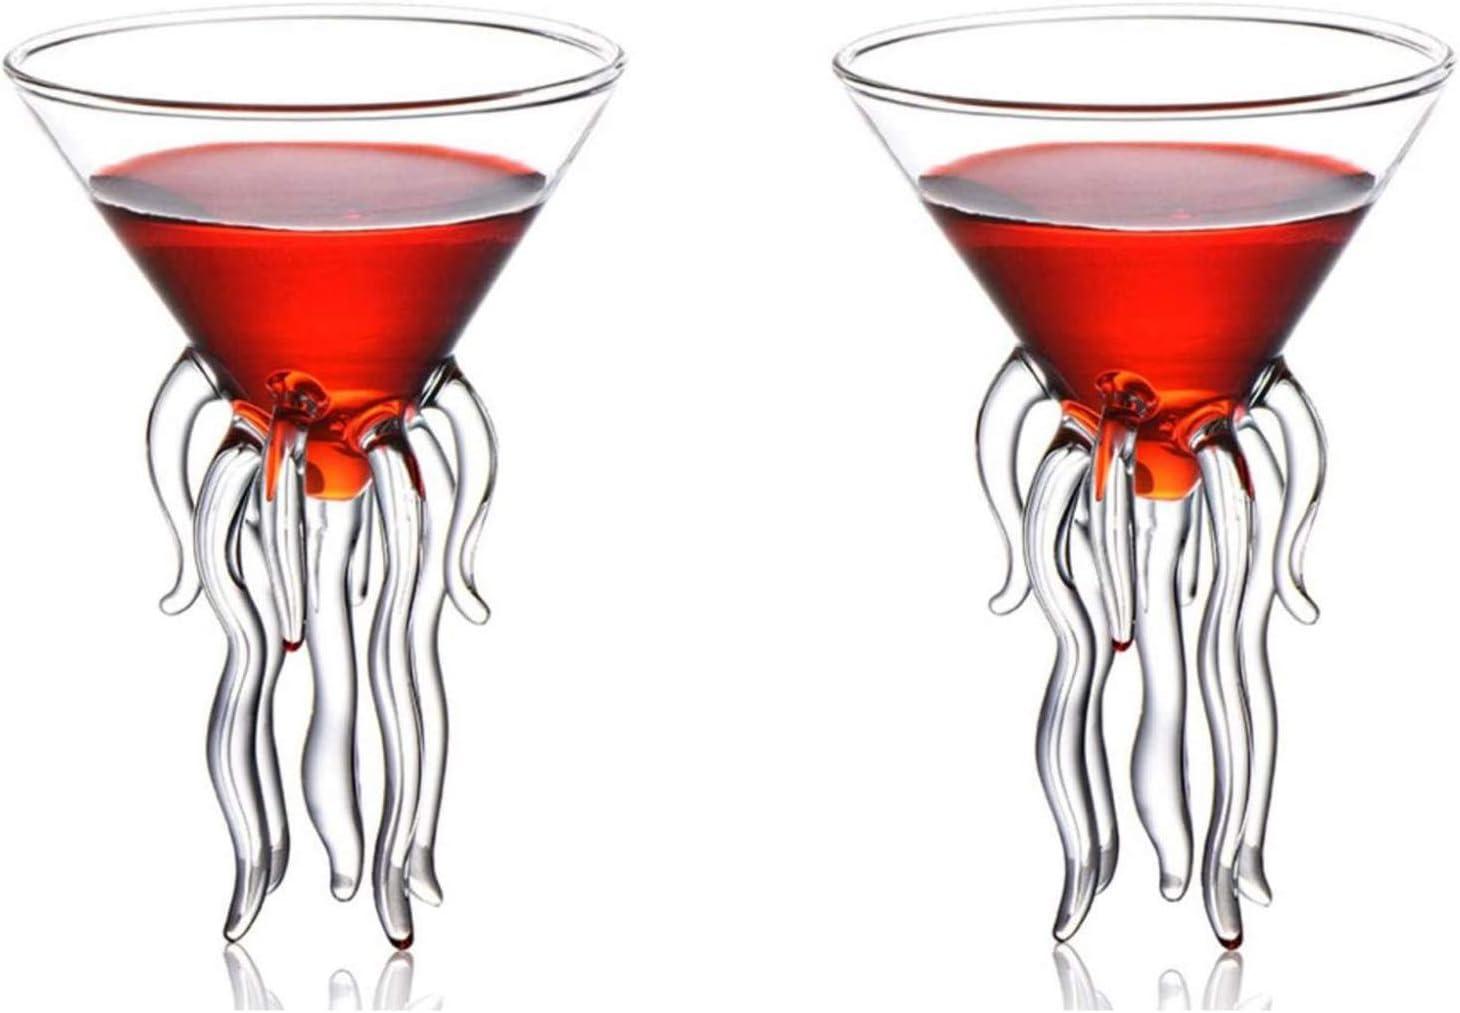 Ranking TOP1 Octopus Jellyfish Martini Glass Wine latest Sty Cthulhu